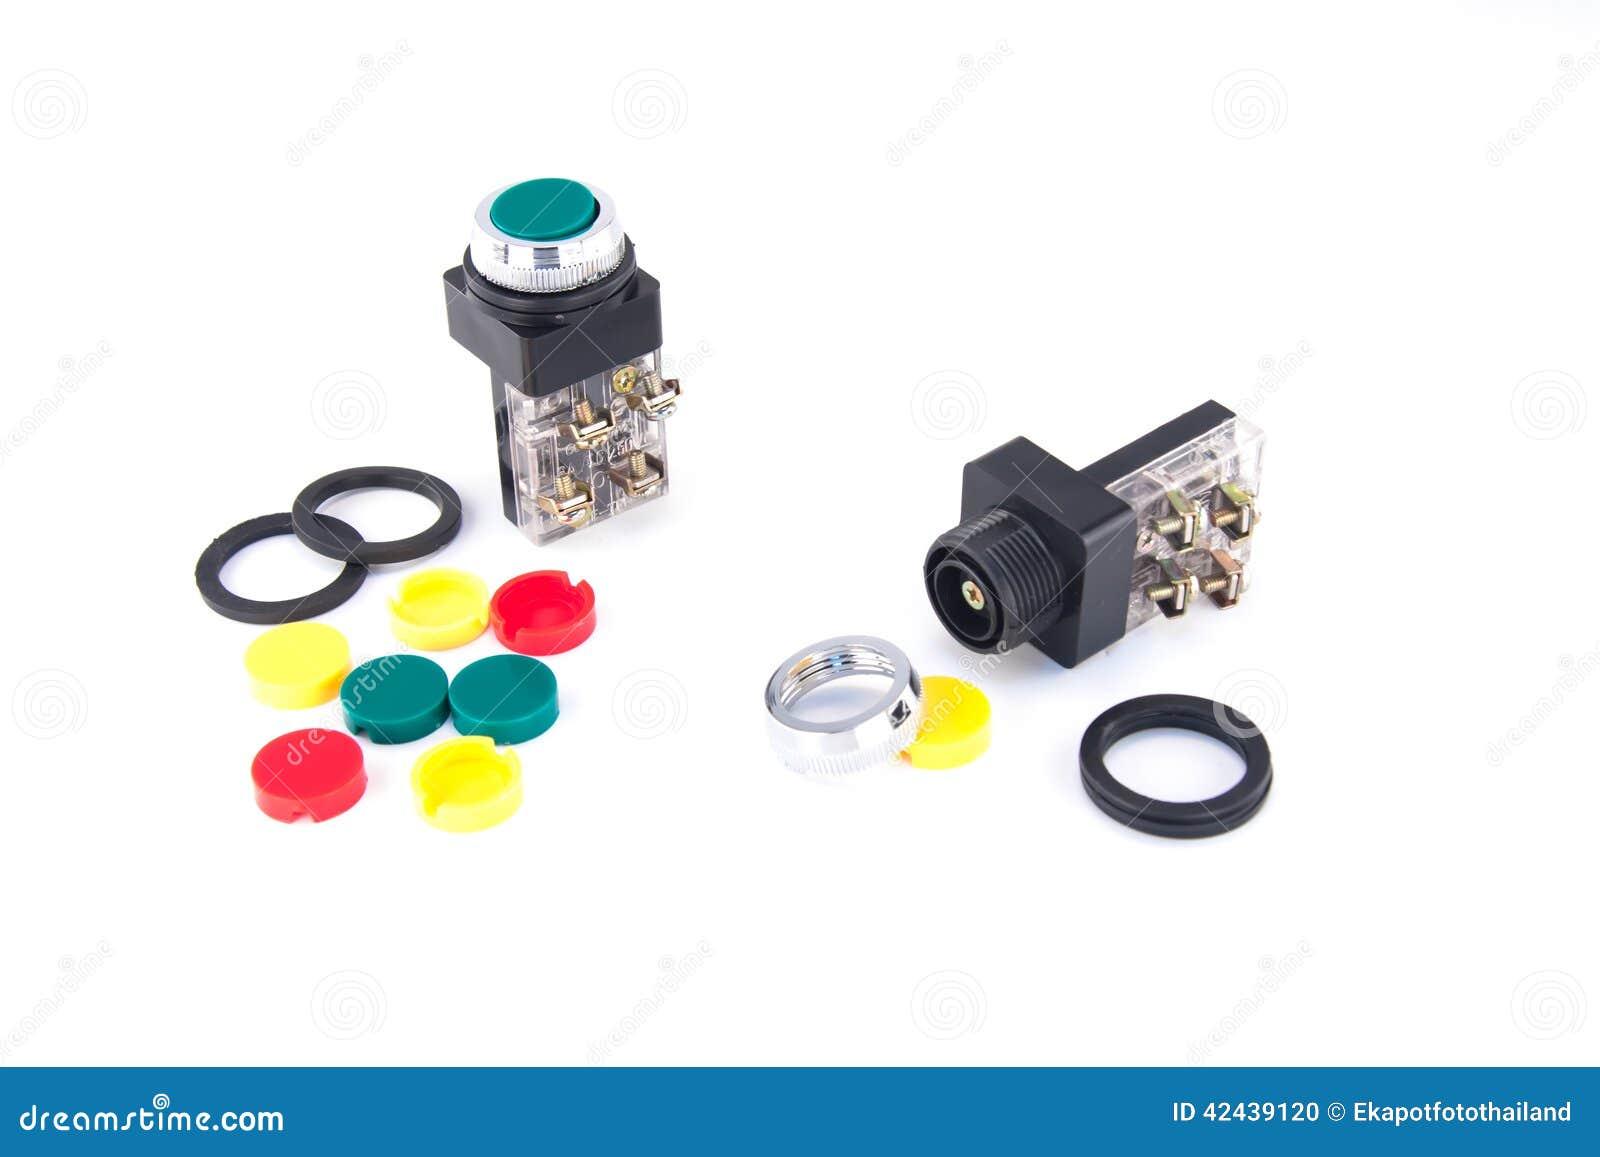 Interruptor de la luz experimental